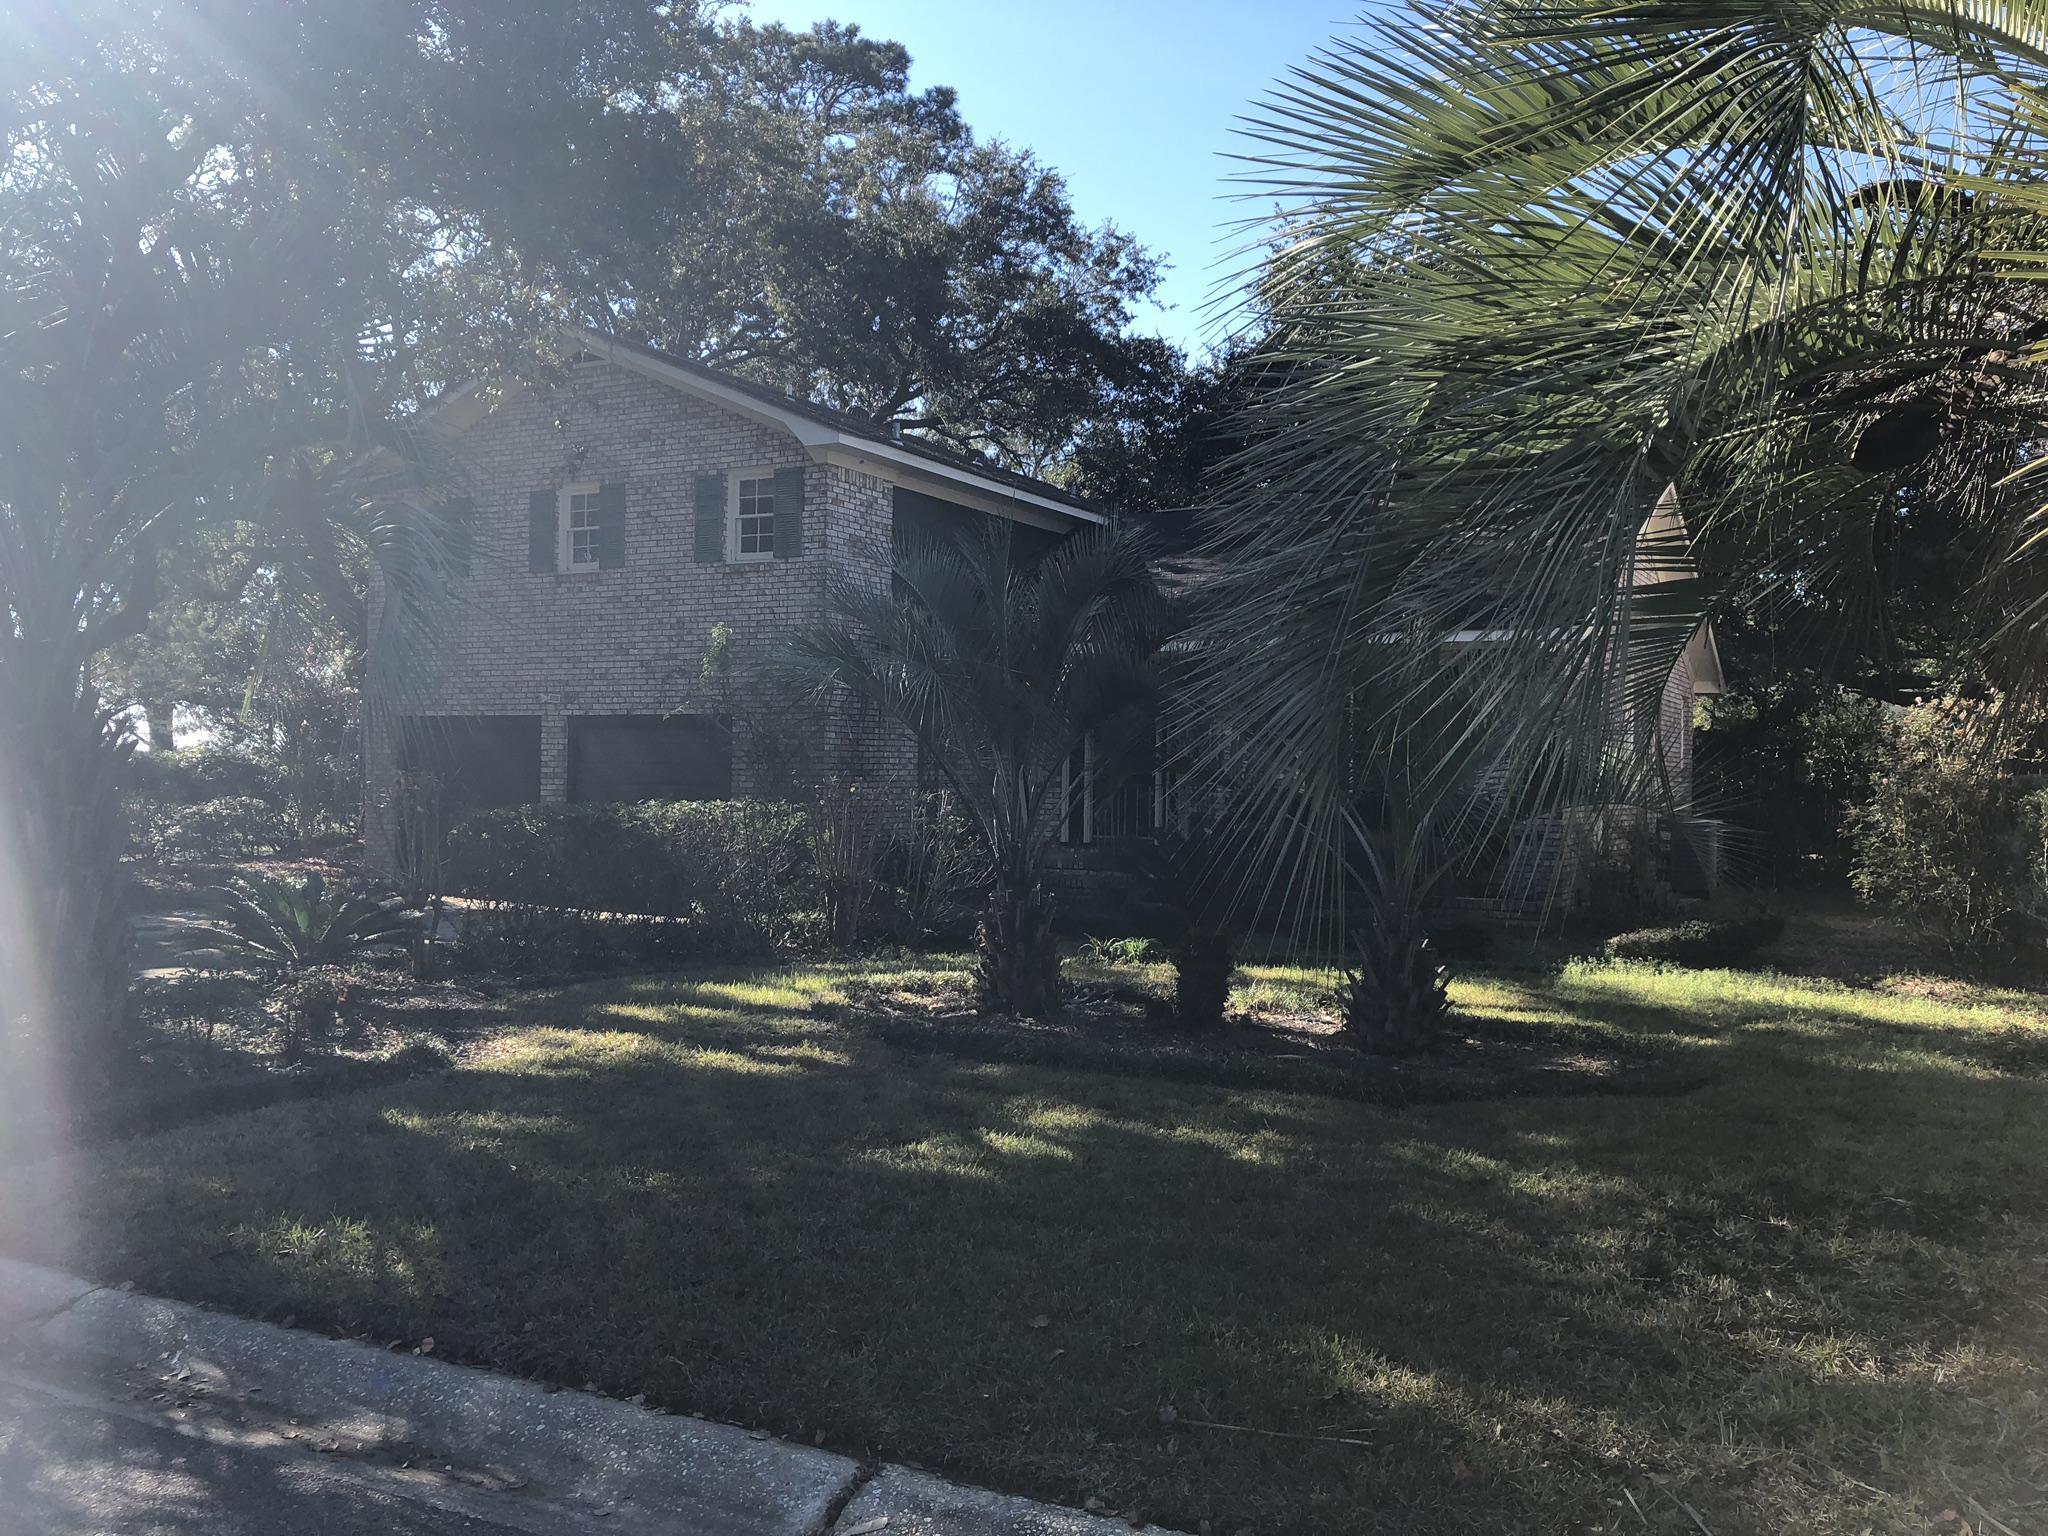 Capri Isles Homes For Sale - 213 Shady, Charleston, SC - 0